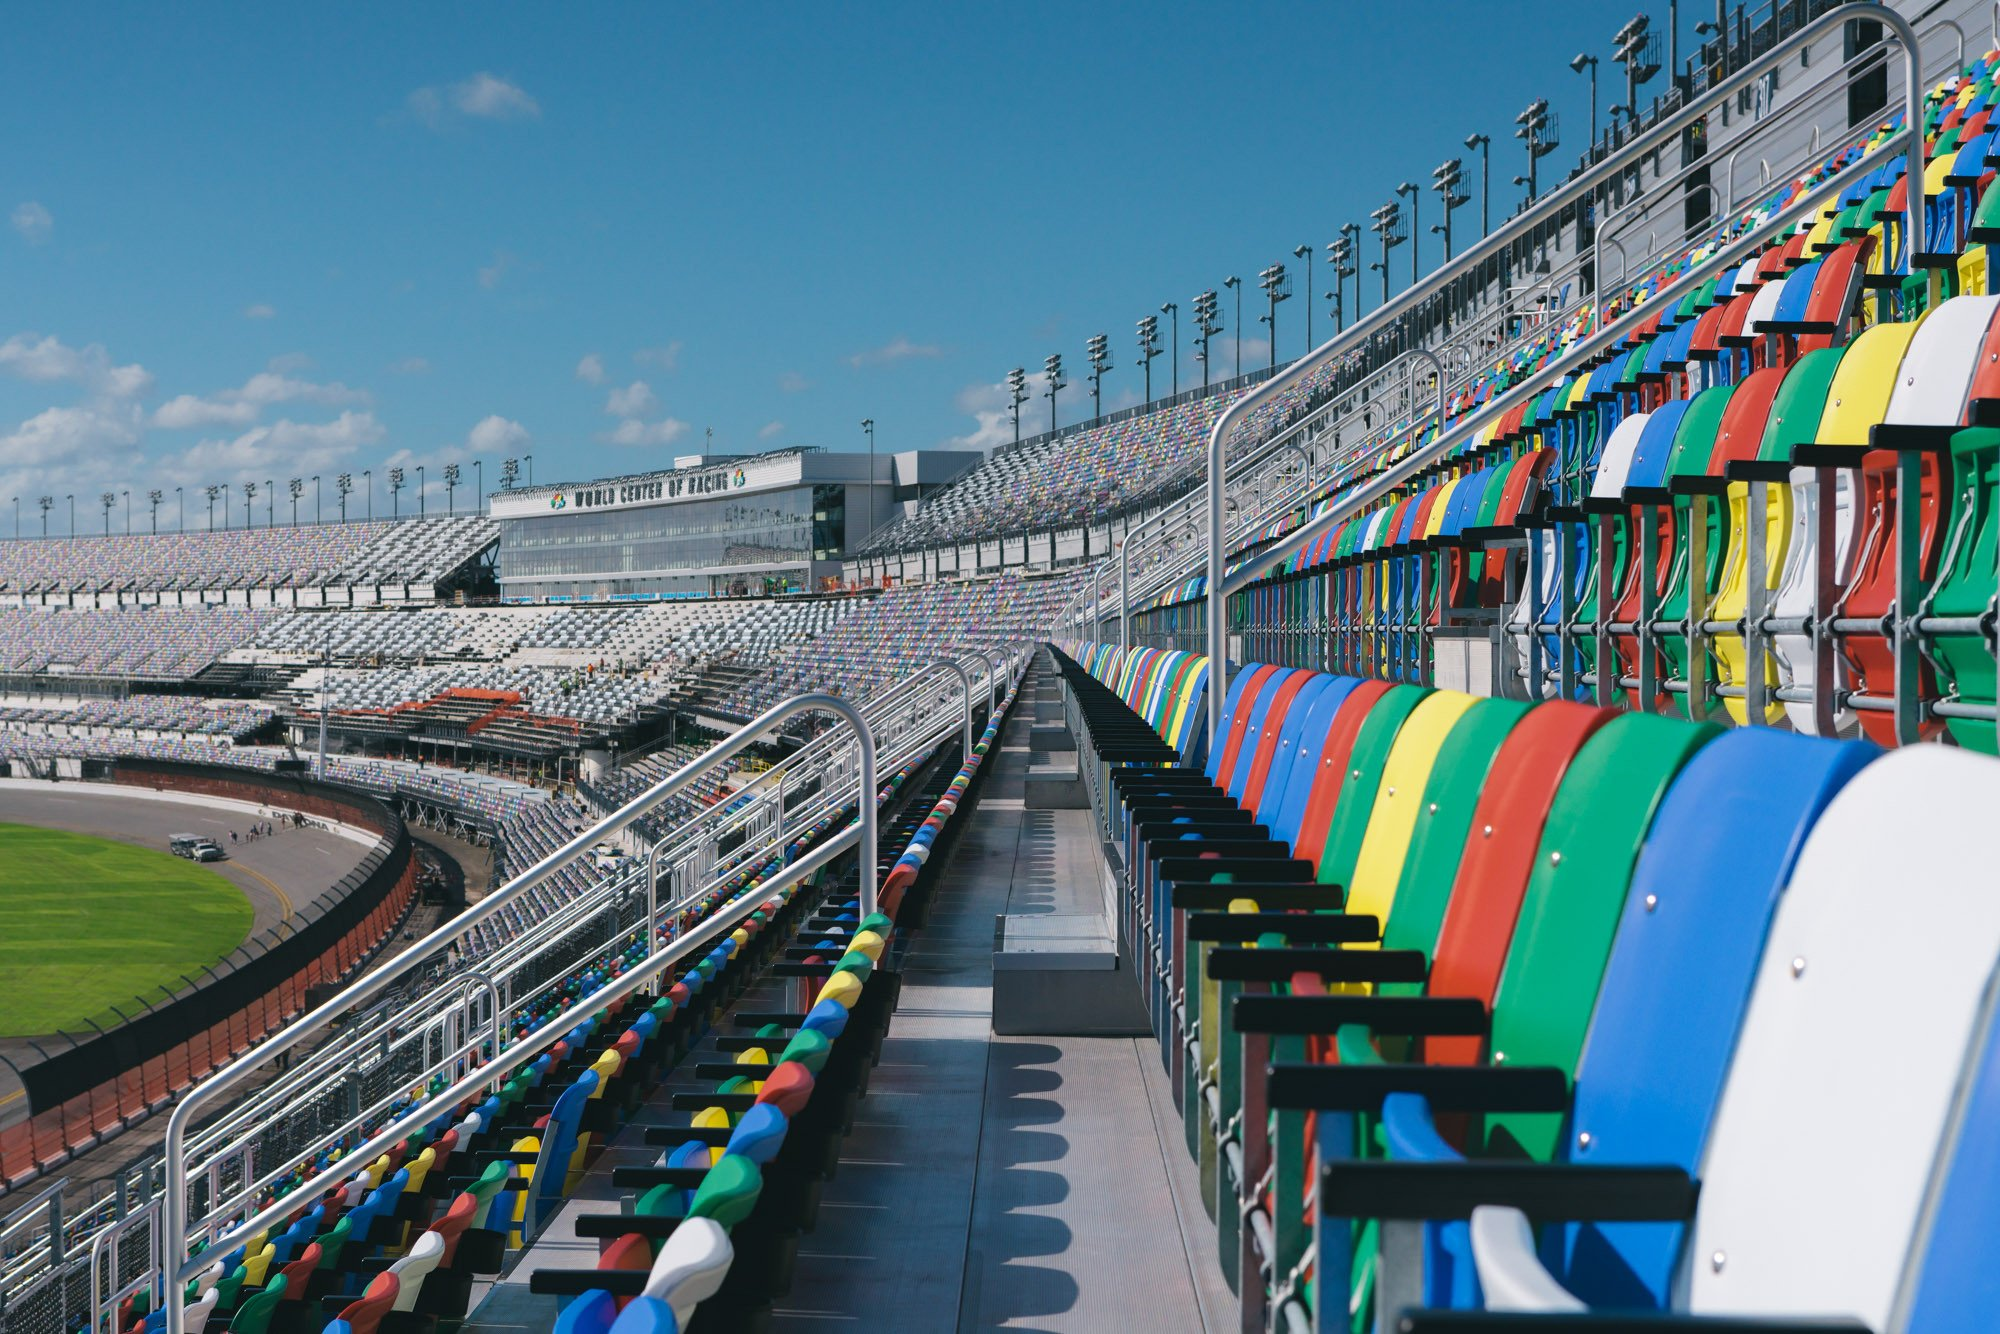 15-12-13_post-img_1744_daytona-speedway-stadium